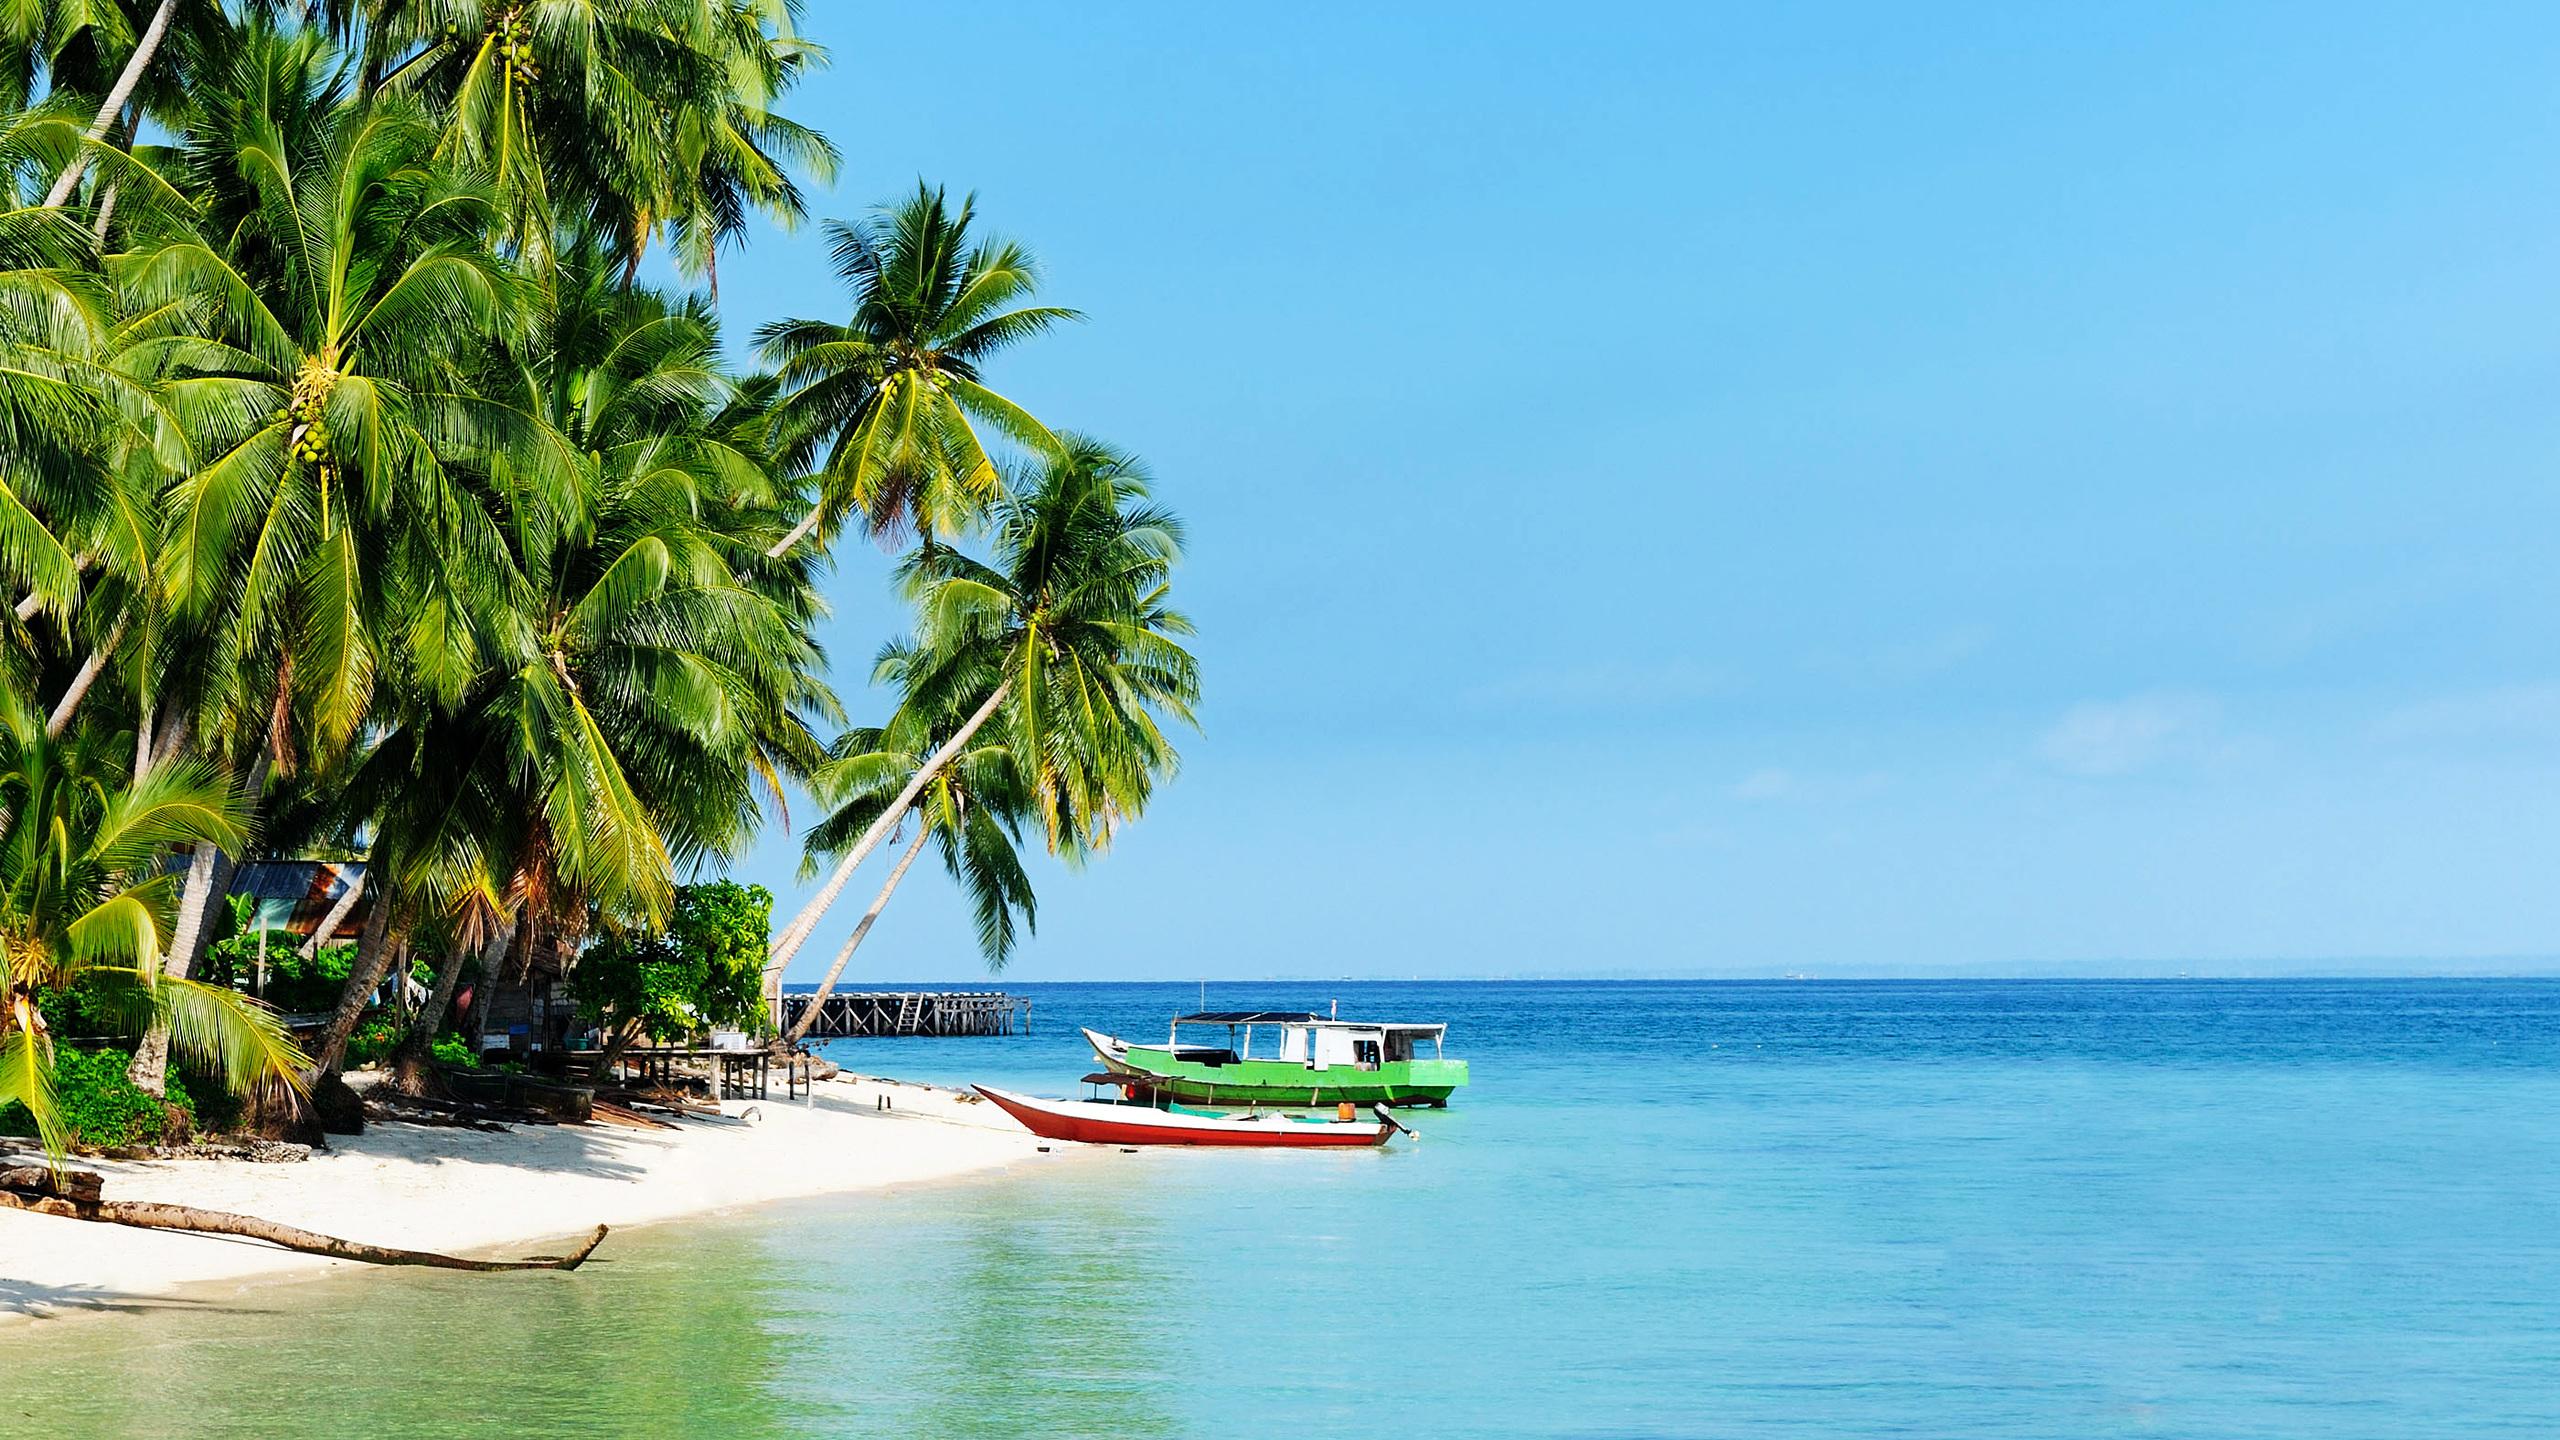 Download Wallpaper Macbook Tropical - white-sandy-beach-of-the-derawan-islands-wallpaper-2560x1440-604  Image_432388.jpg